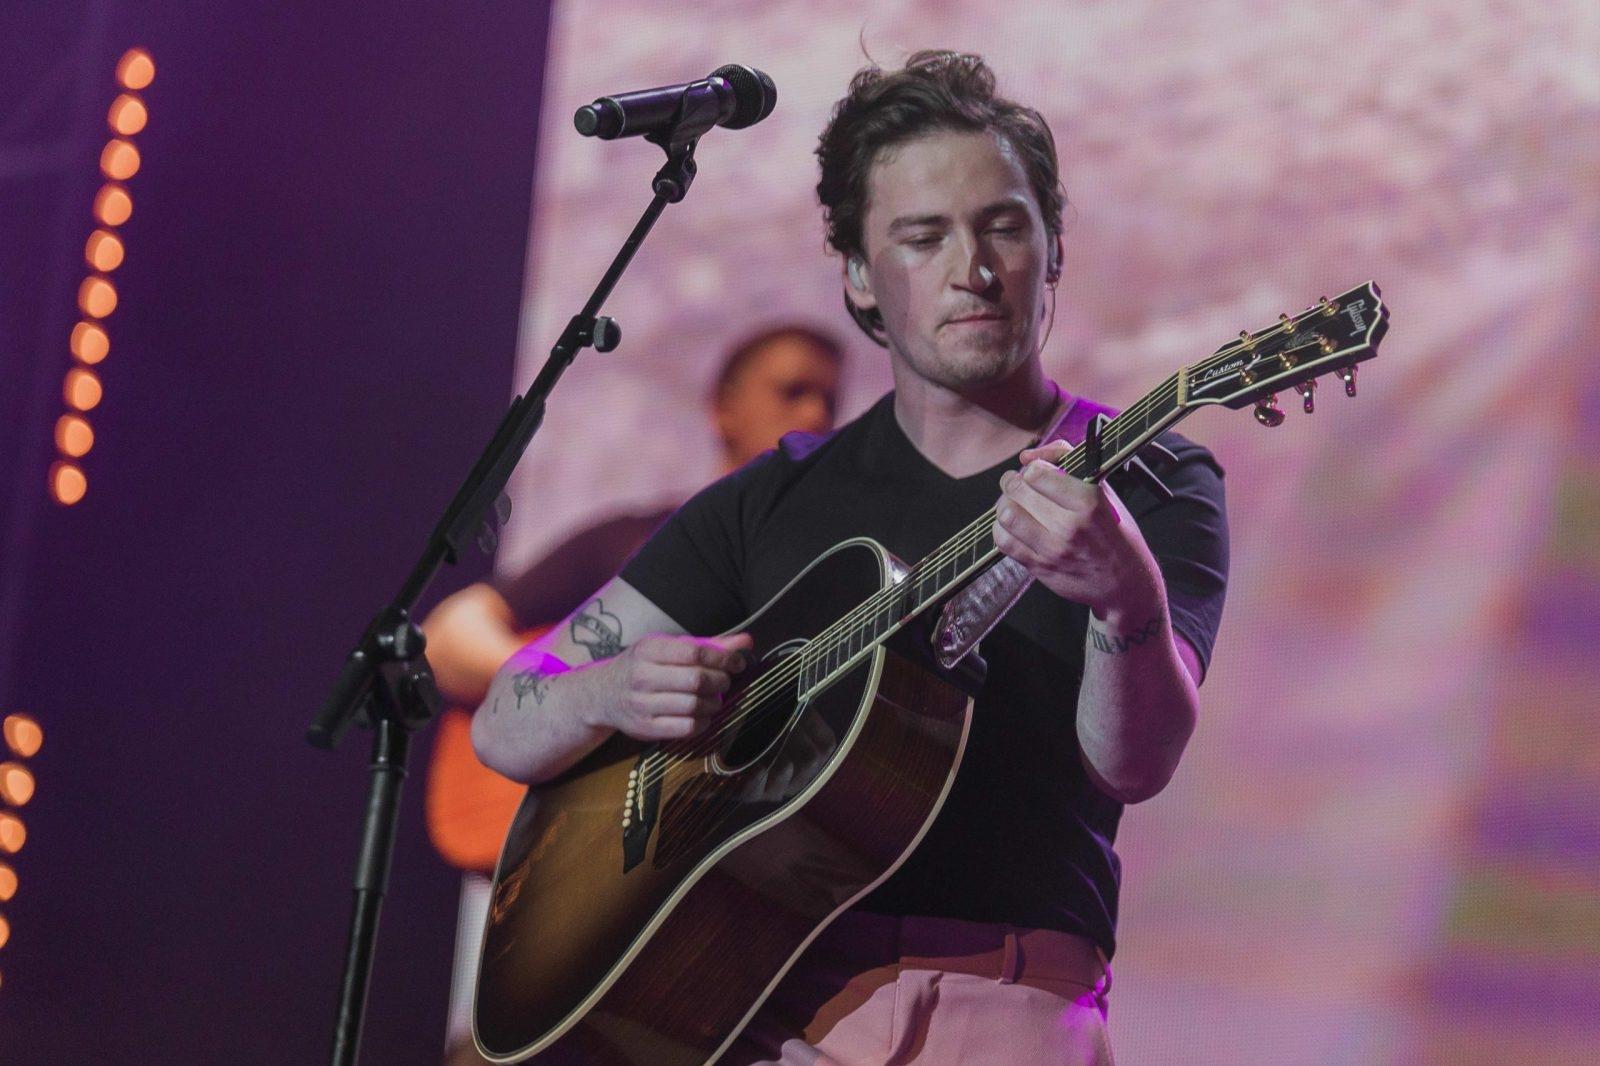 Ryan Hennessy playing guitar